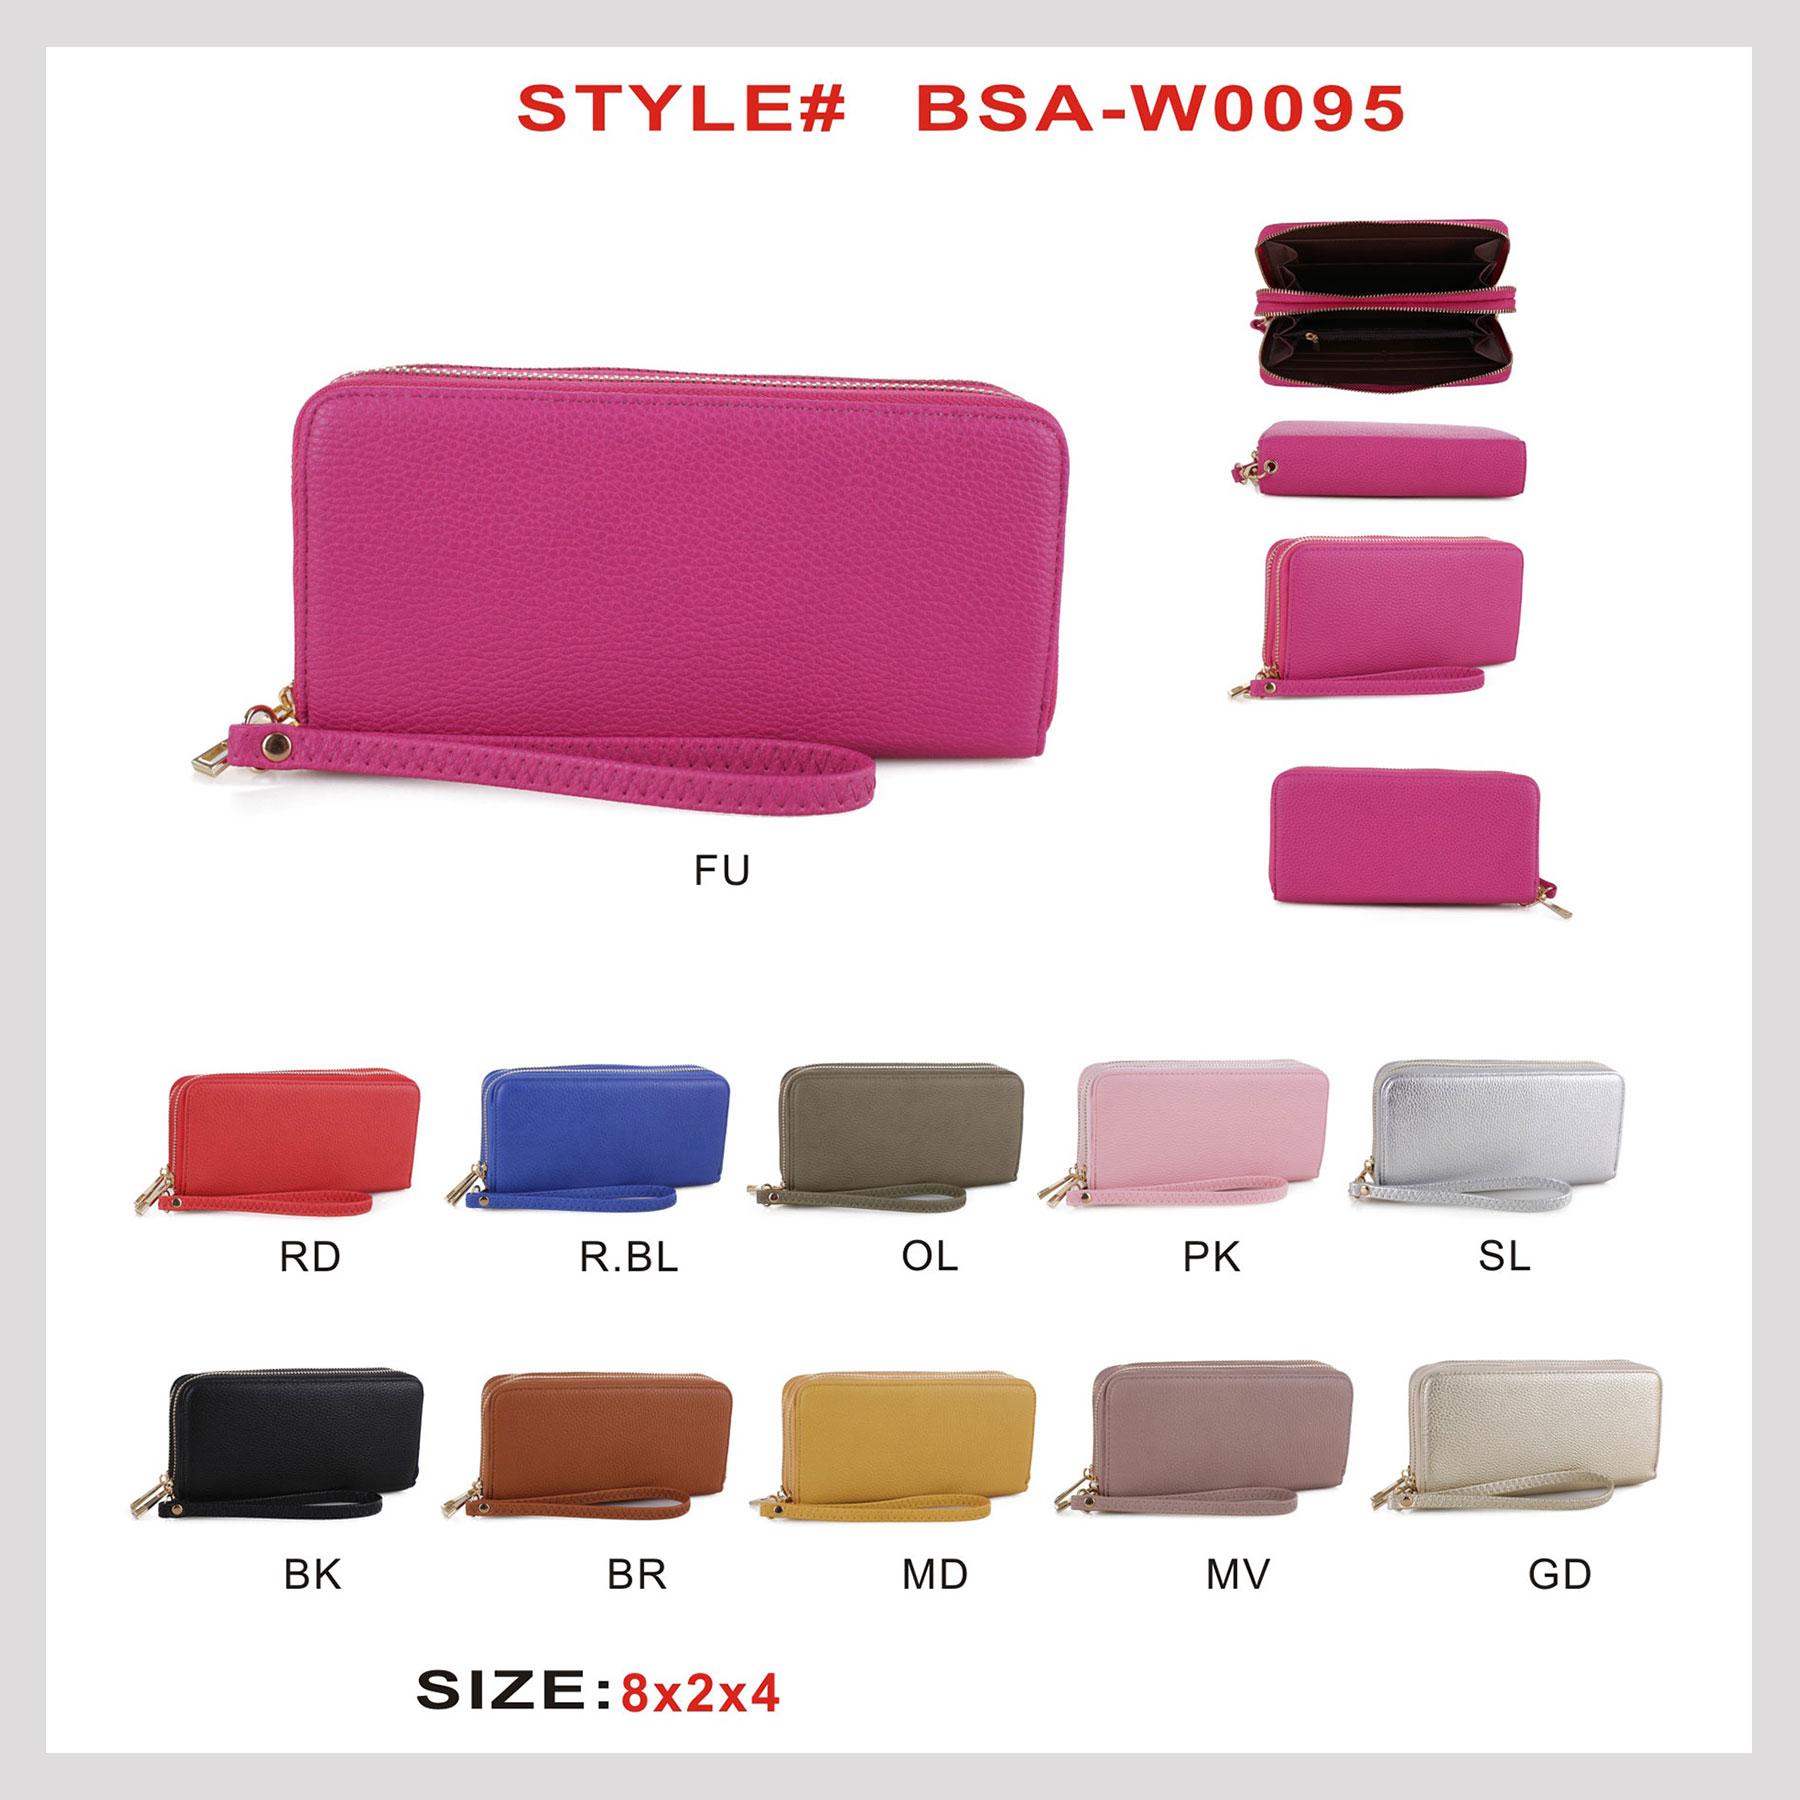 BSA-W0095.jpg